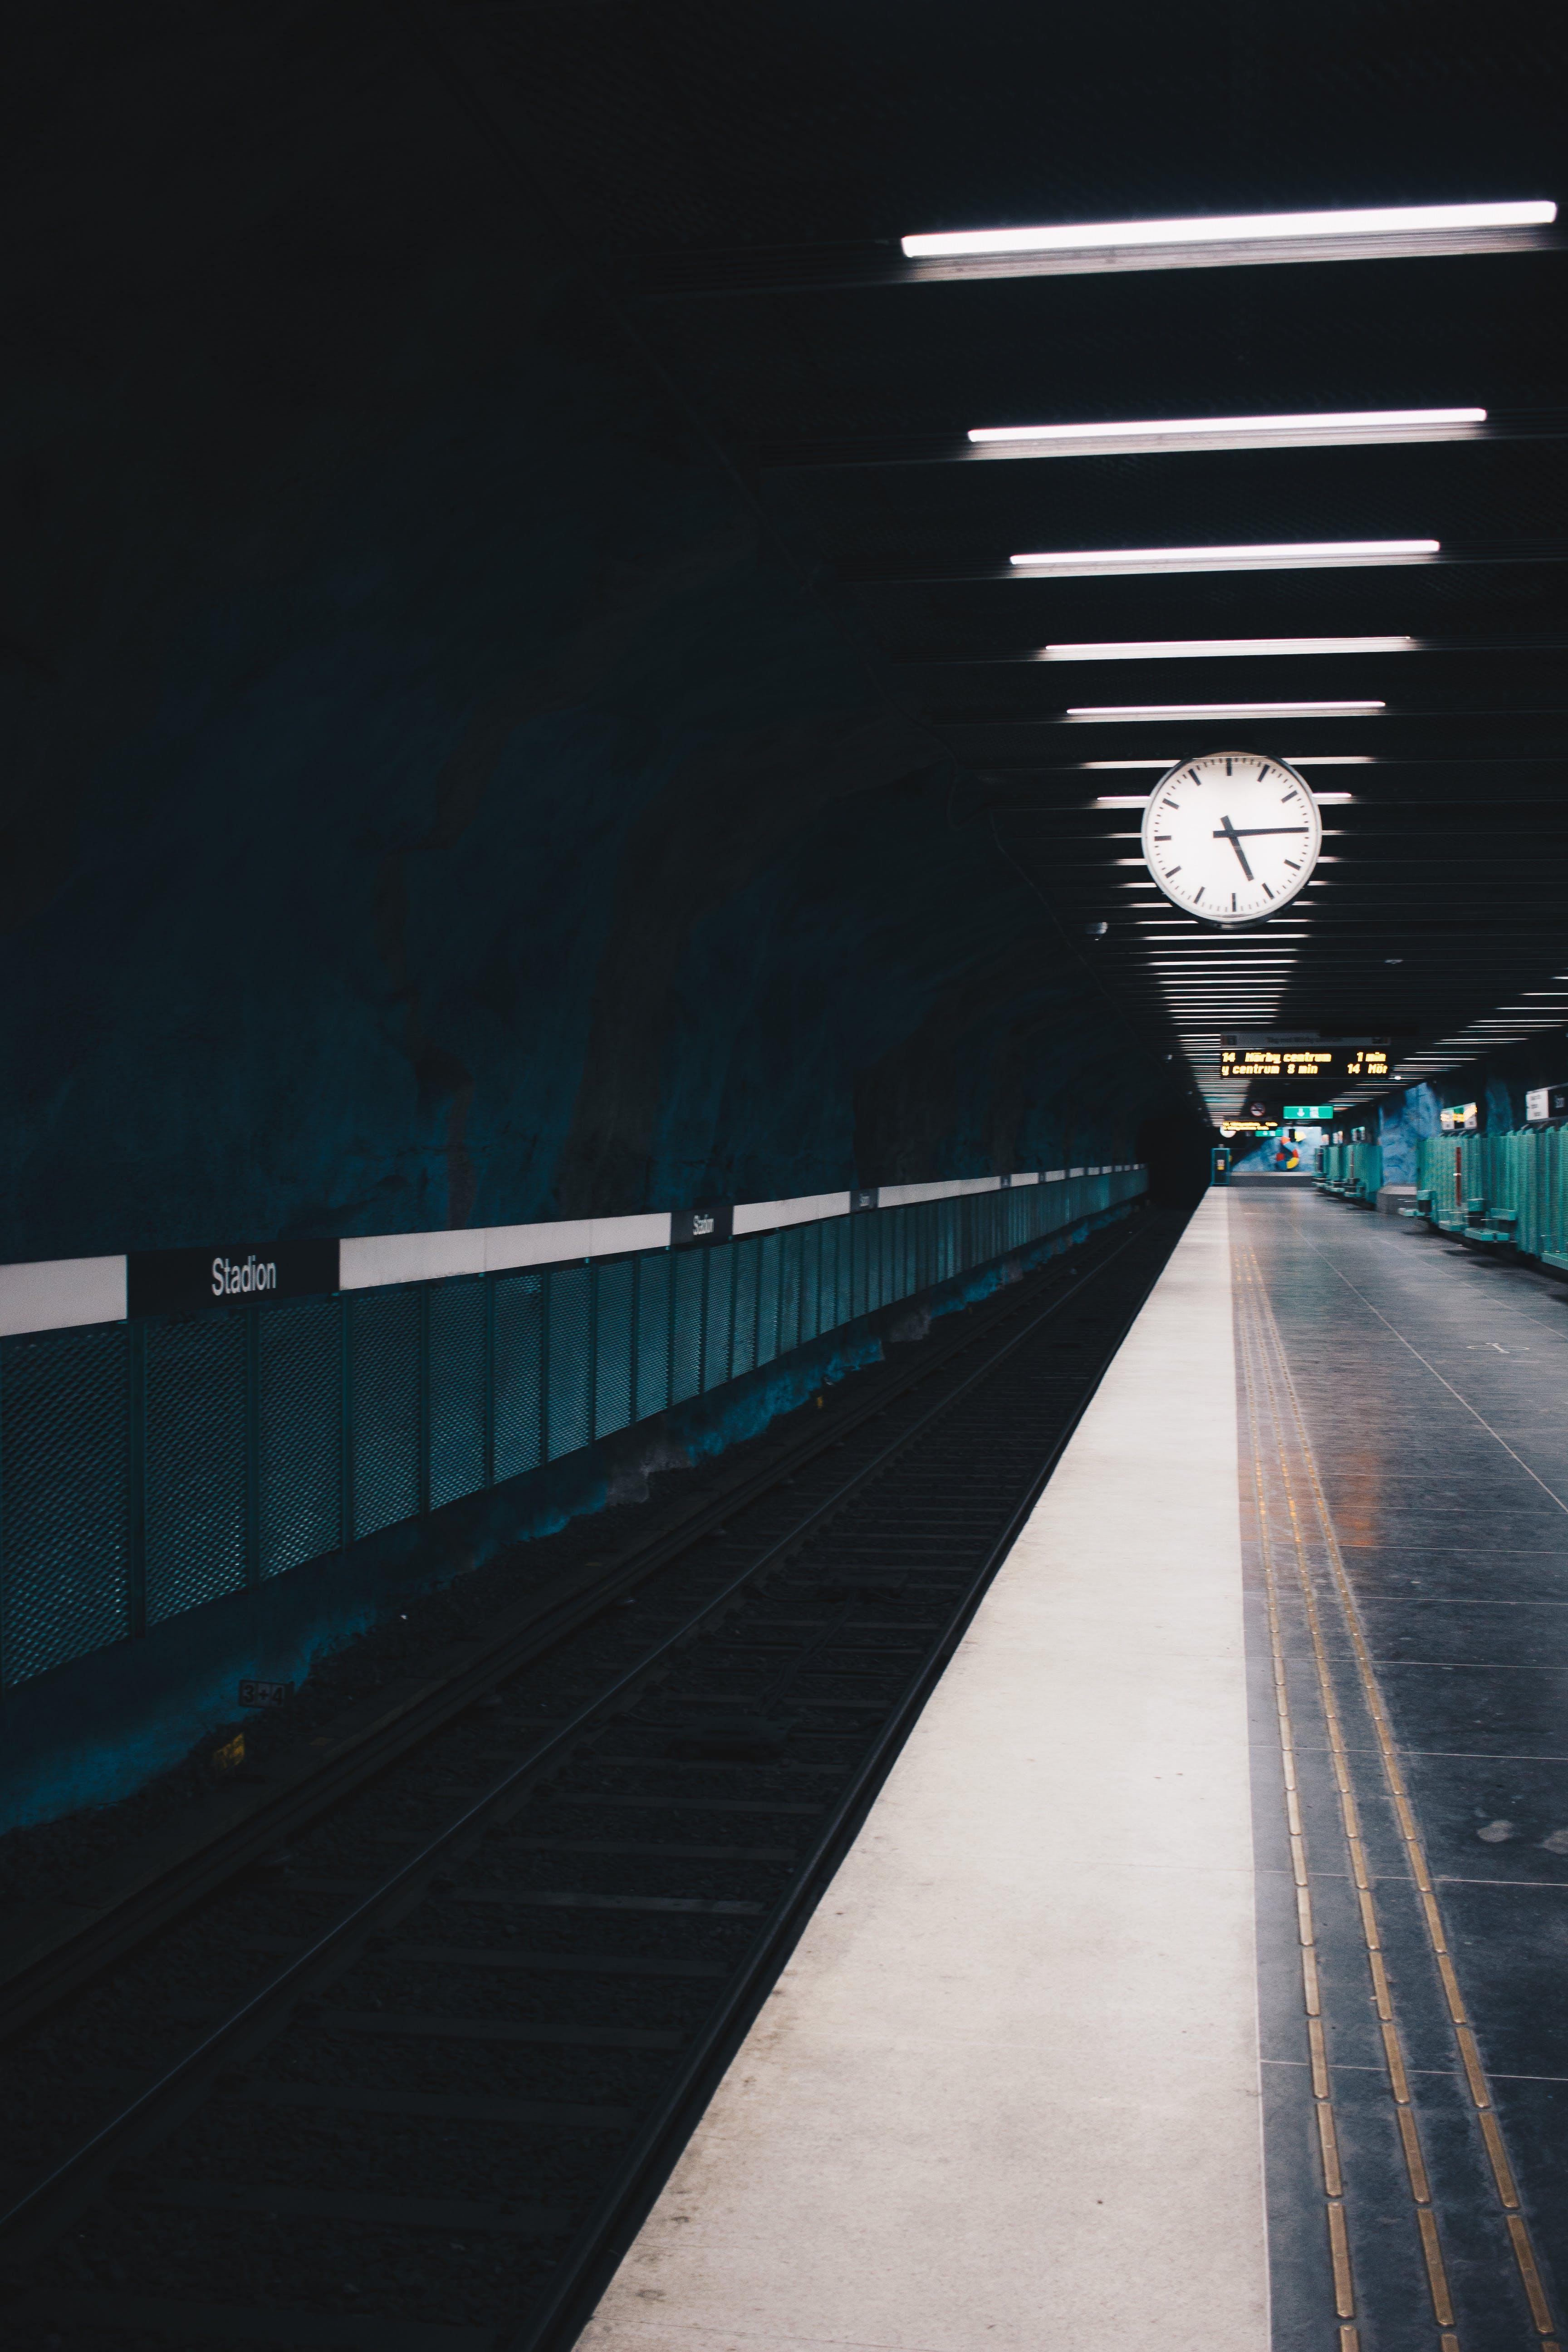 Photo of Empty Train Station Platform